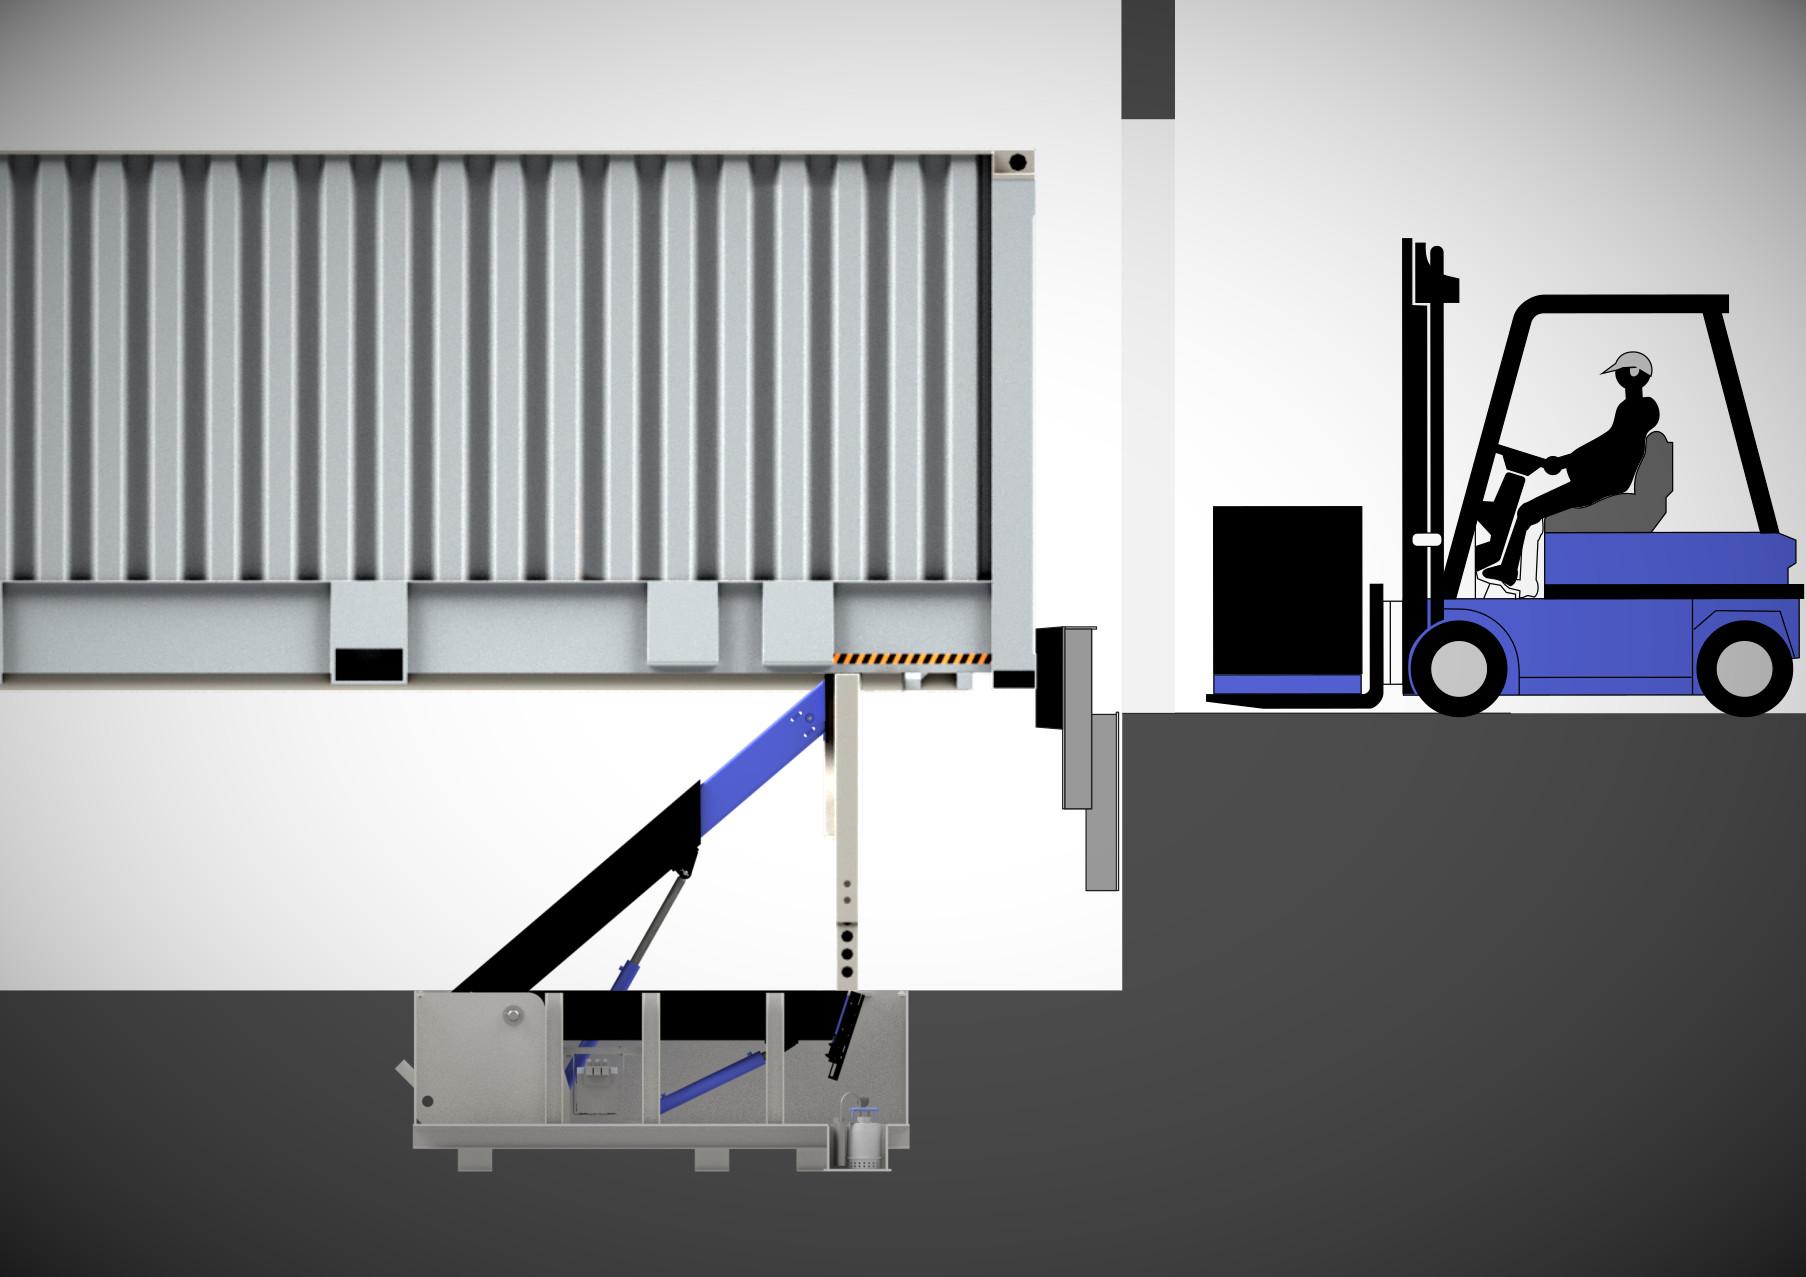 BLOCKDOCK-V2 bei Wechselbrücken-Verladung. zweiter Blockarm hebt zum Stahlbalken an